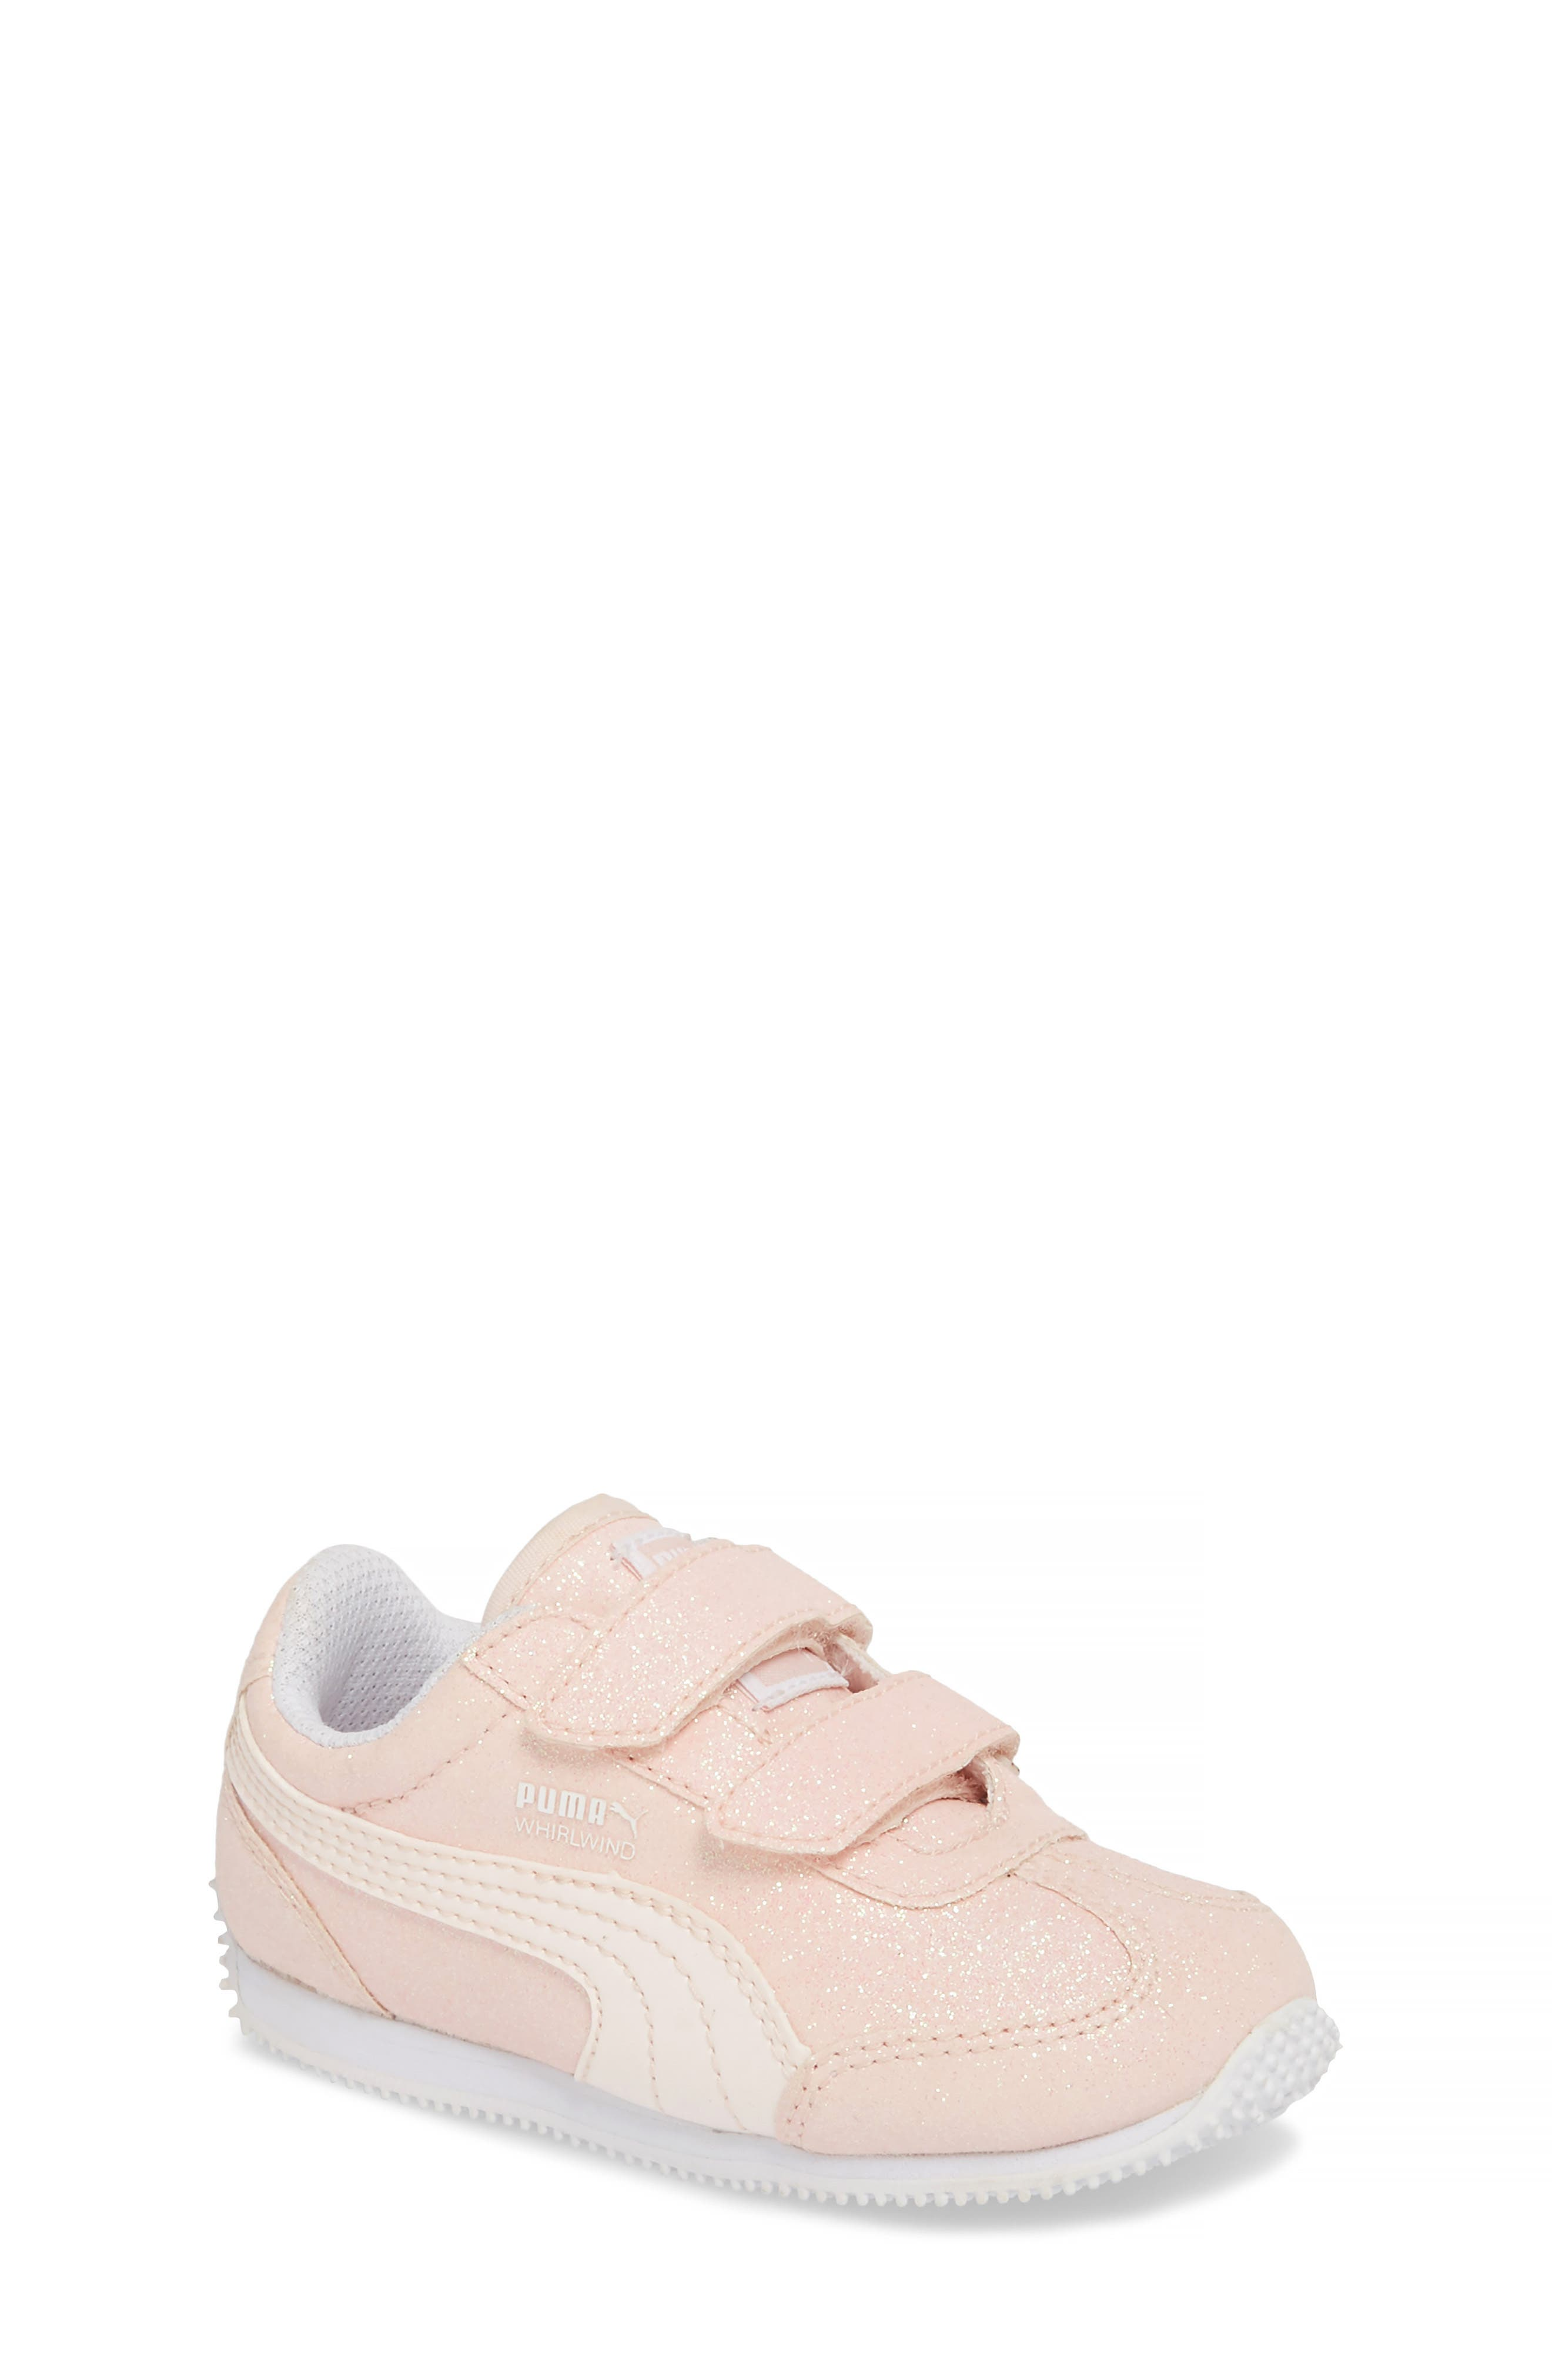 Girls' Girls' Shoes Nordstrom Puma Puma OOfrxnP